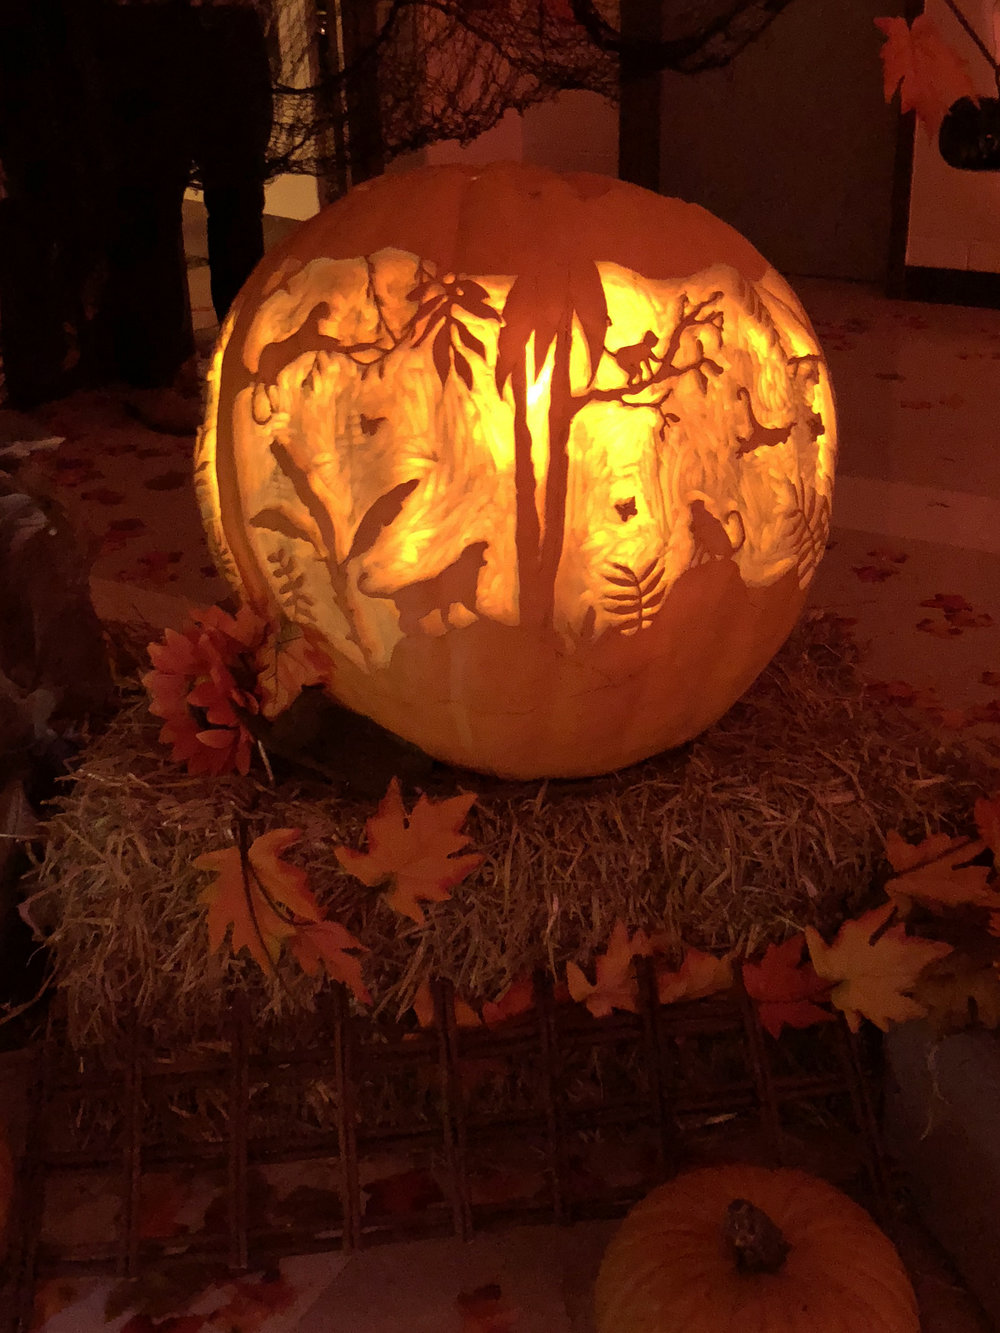 jungle-carved-pumpkin.jpg